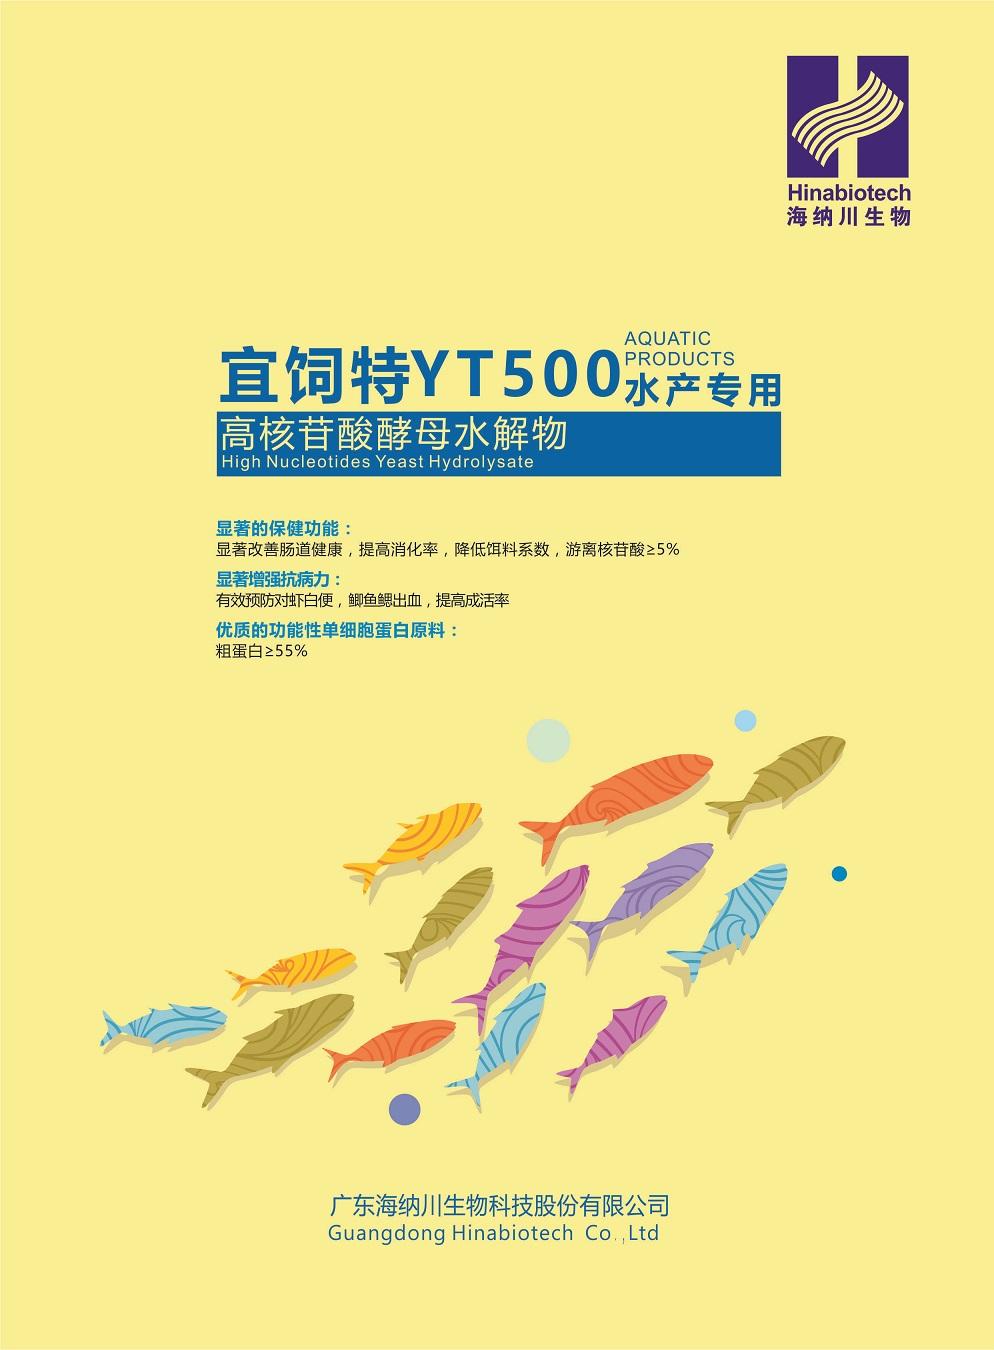 宜饲特YT500